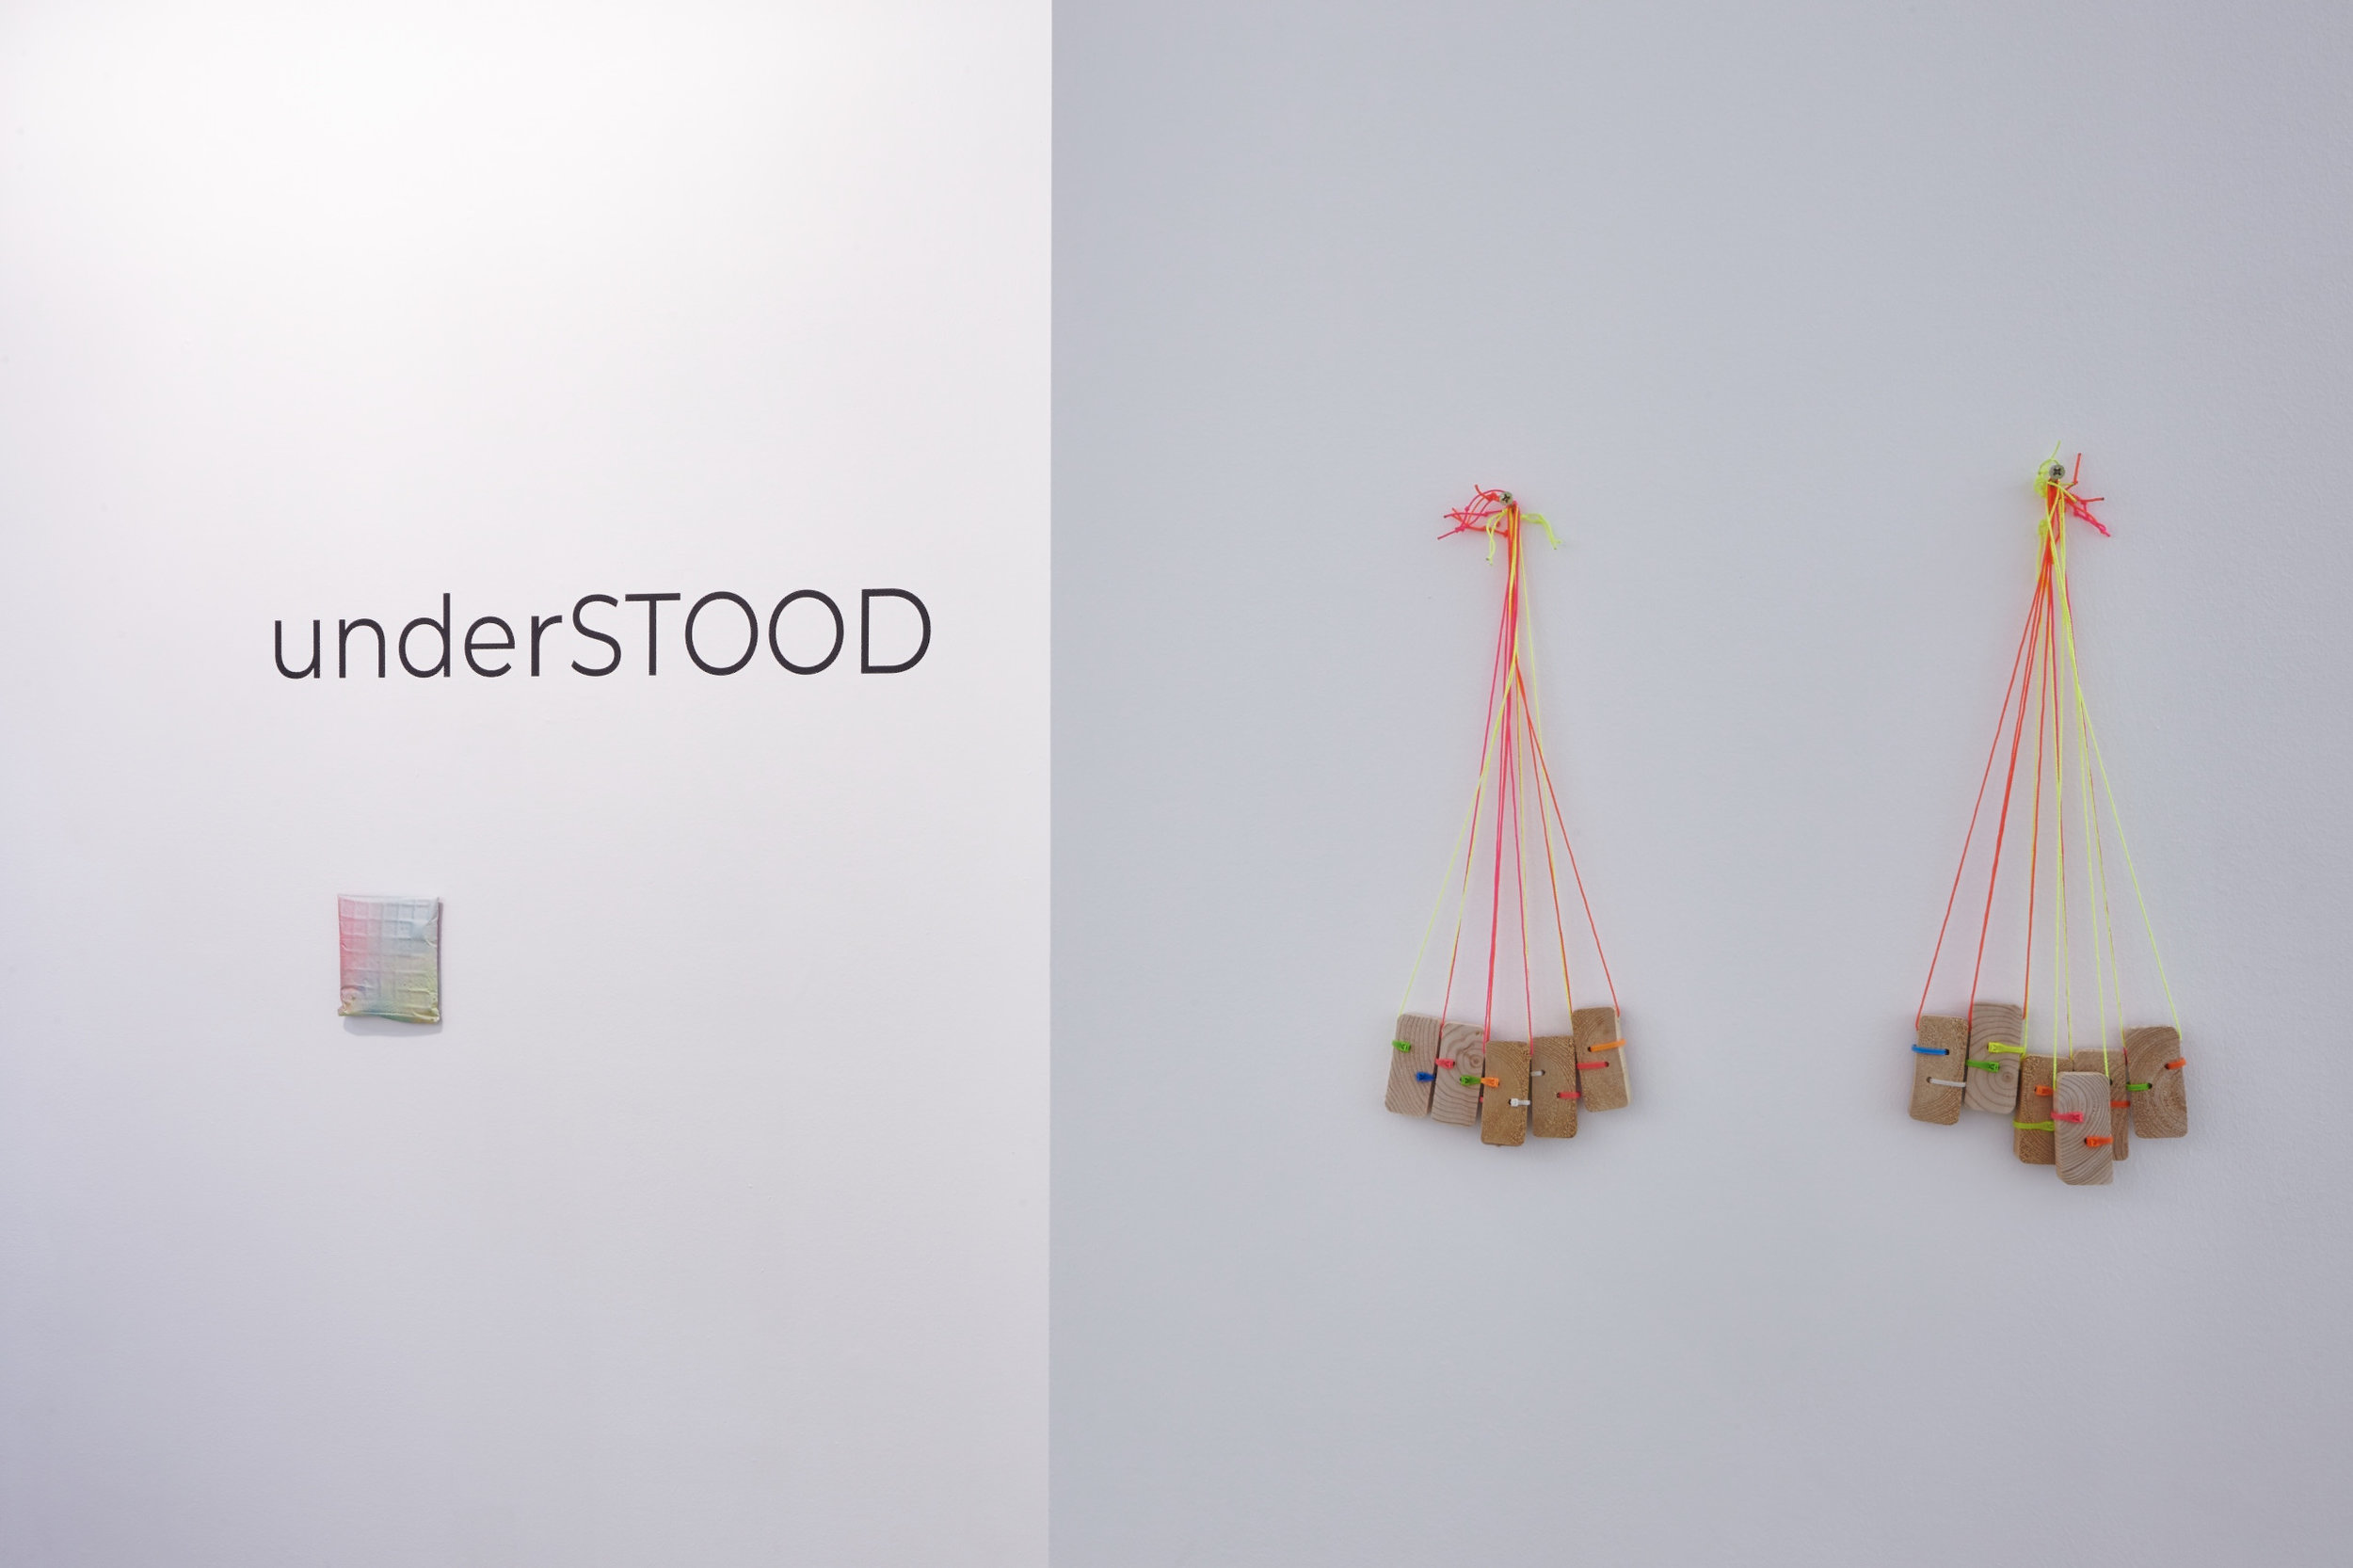 Group show underSTOOD, ROCKELMANN & PARTNER, 2018, Photo: Joseph Devitt Tremblay